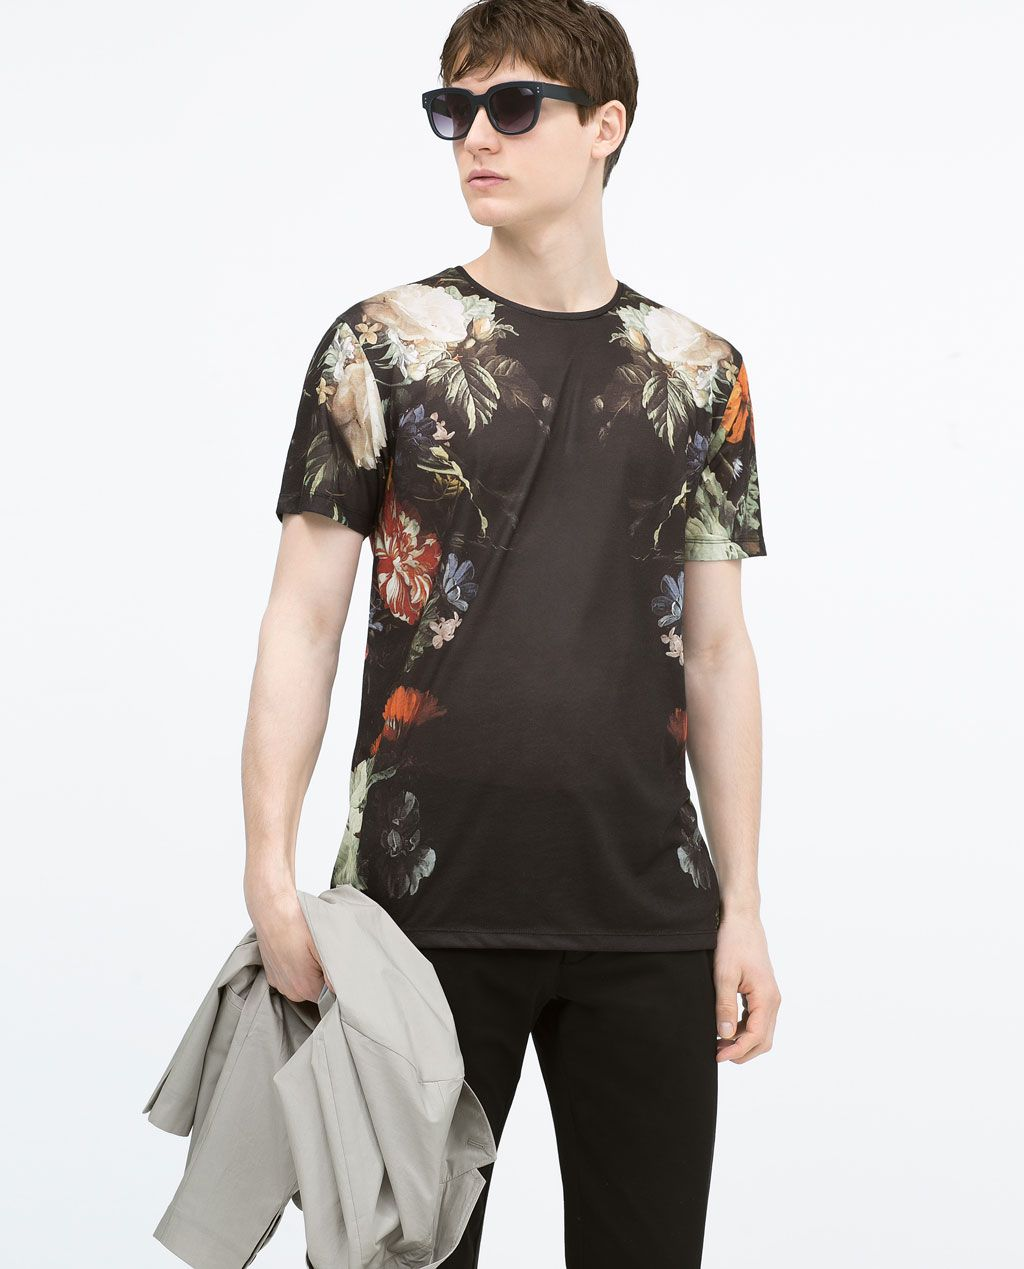 Zara black t shirt india - Short Sleeve T Shirt Pattern T Shirts Man Zara United